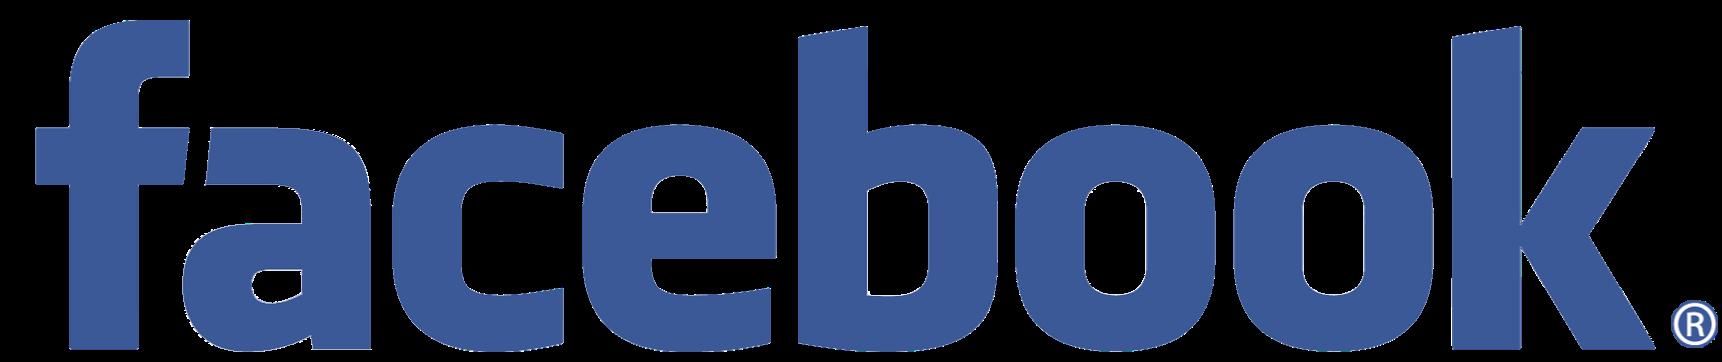 Web Agency Partner Facebook